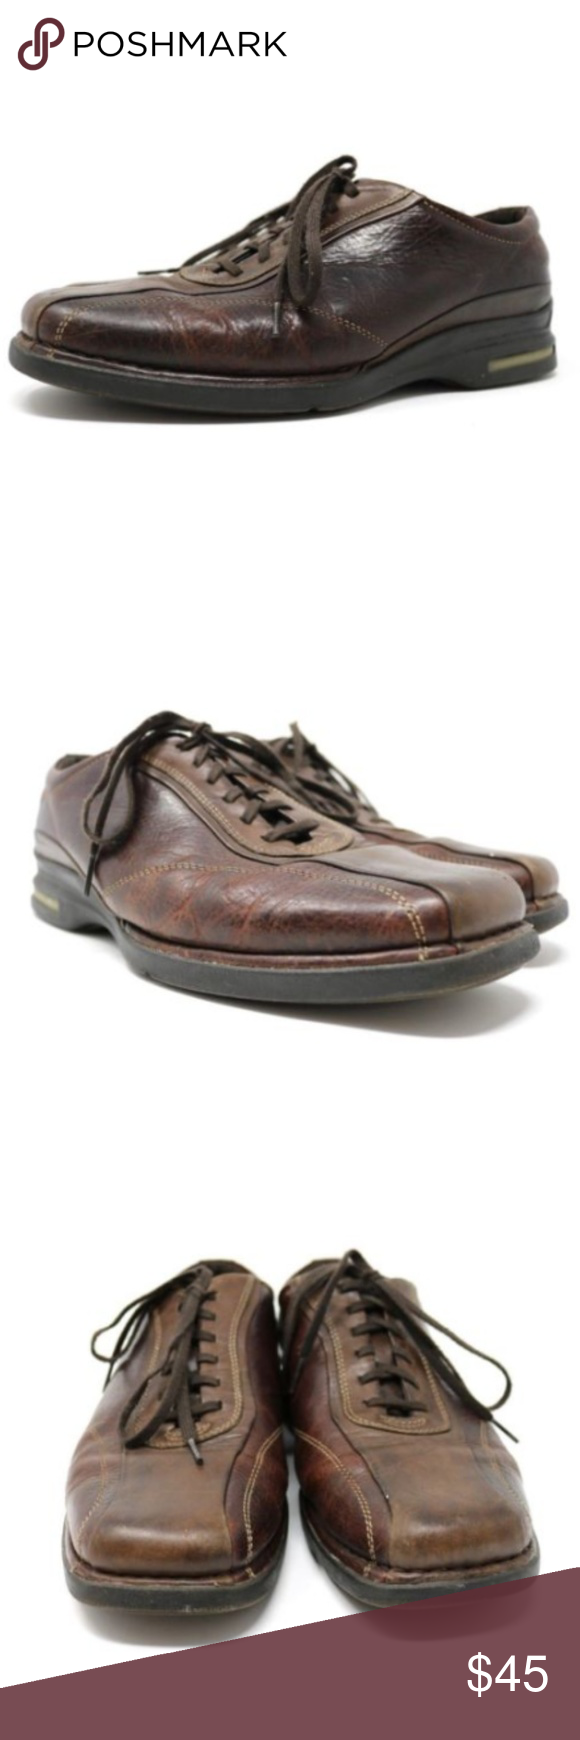 ROCKPORT Mens Shoes Signature Series